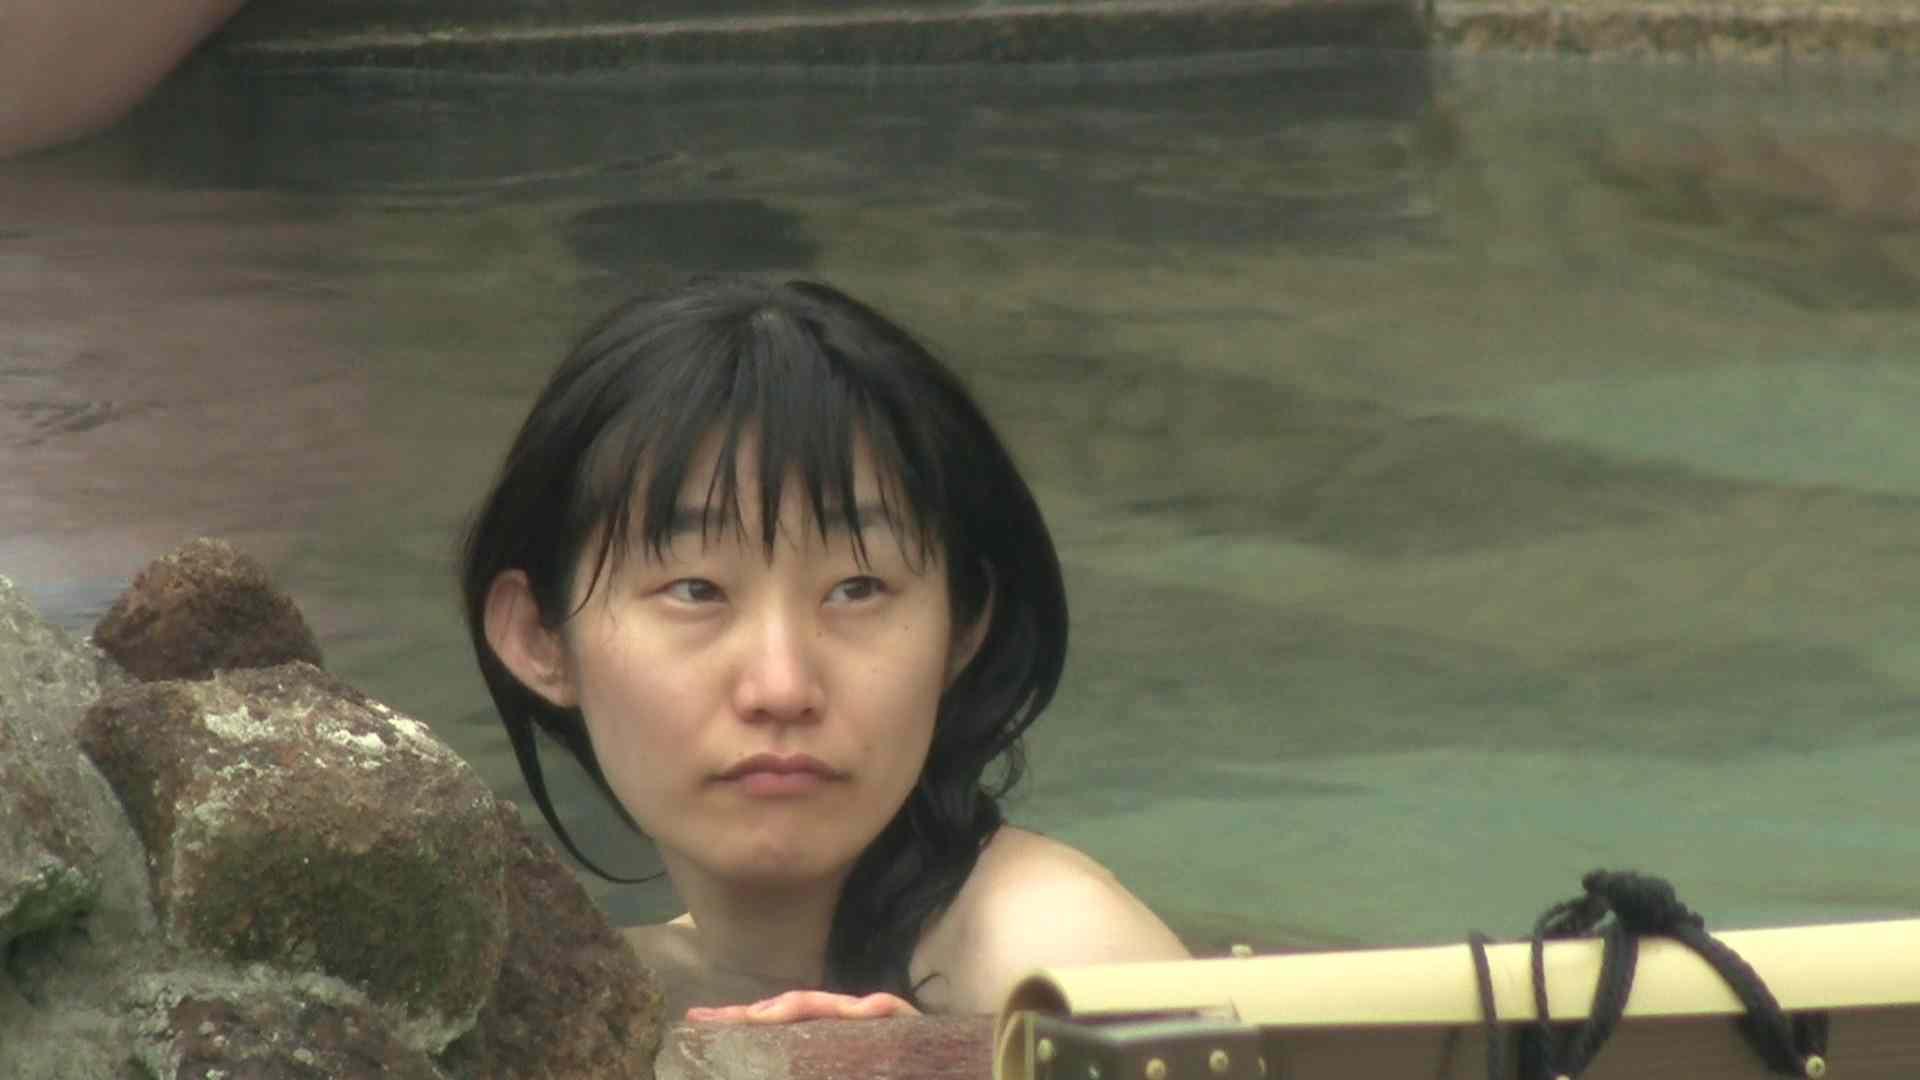 Aquaな露天風呂Vol.14【VIP】 HなOL | 盗撮  58pic 35